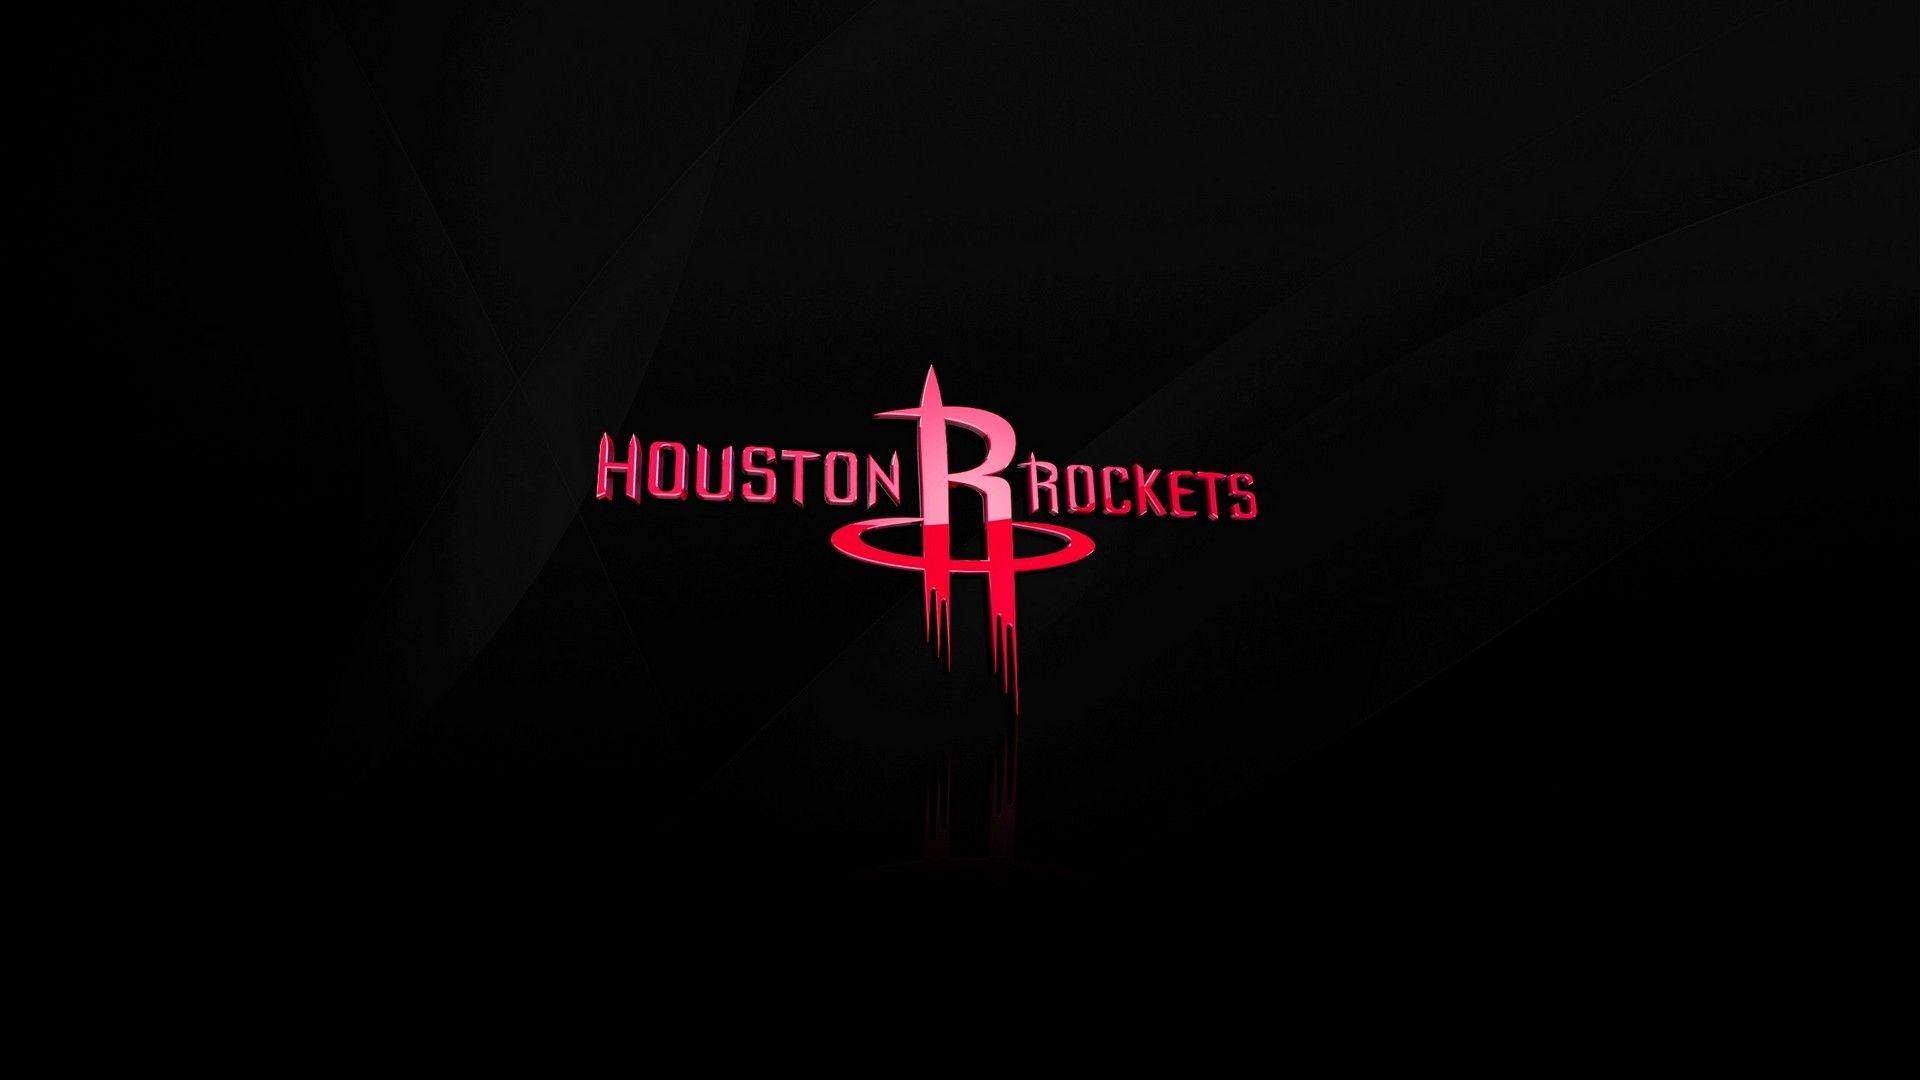 Houston Rockets Wallpaper HD | Best Basketball Wallpapers